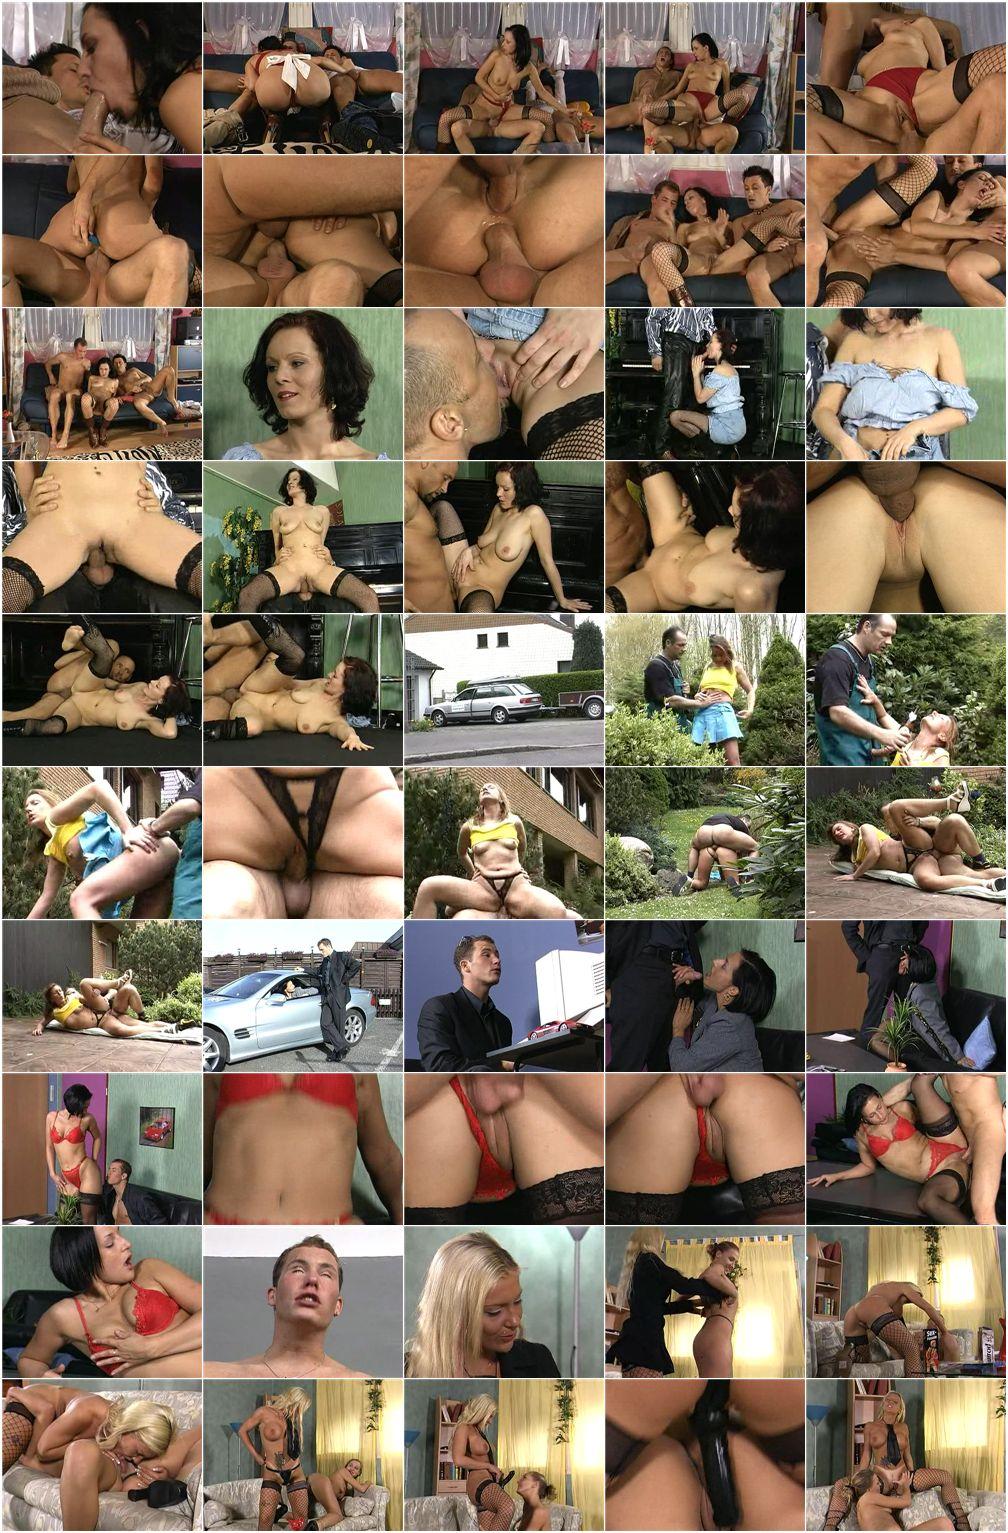 1001-2000 идентификация фильмов rapetub.net эротика в ...